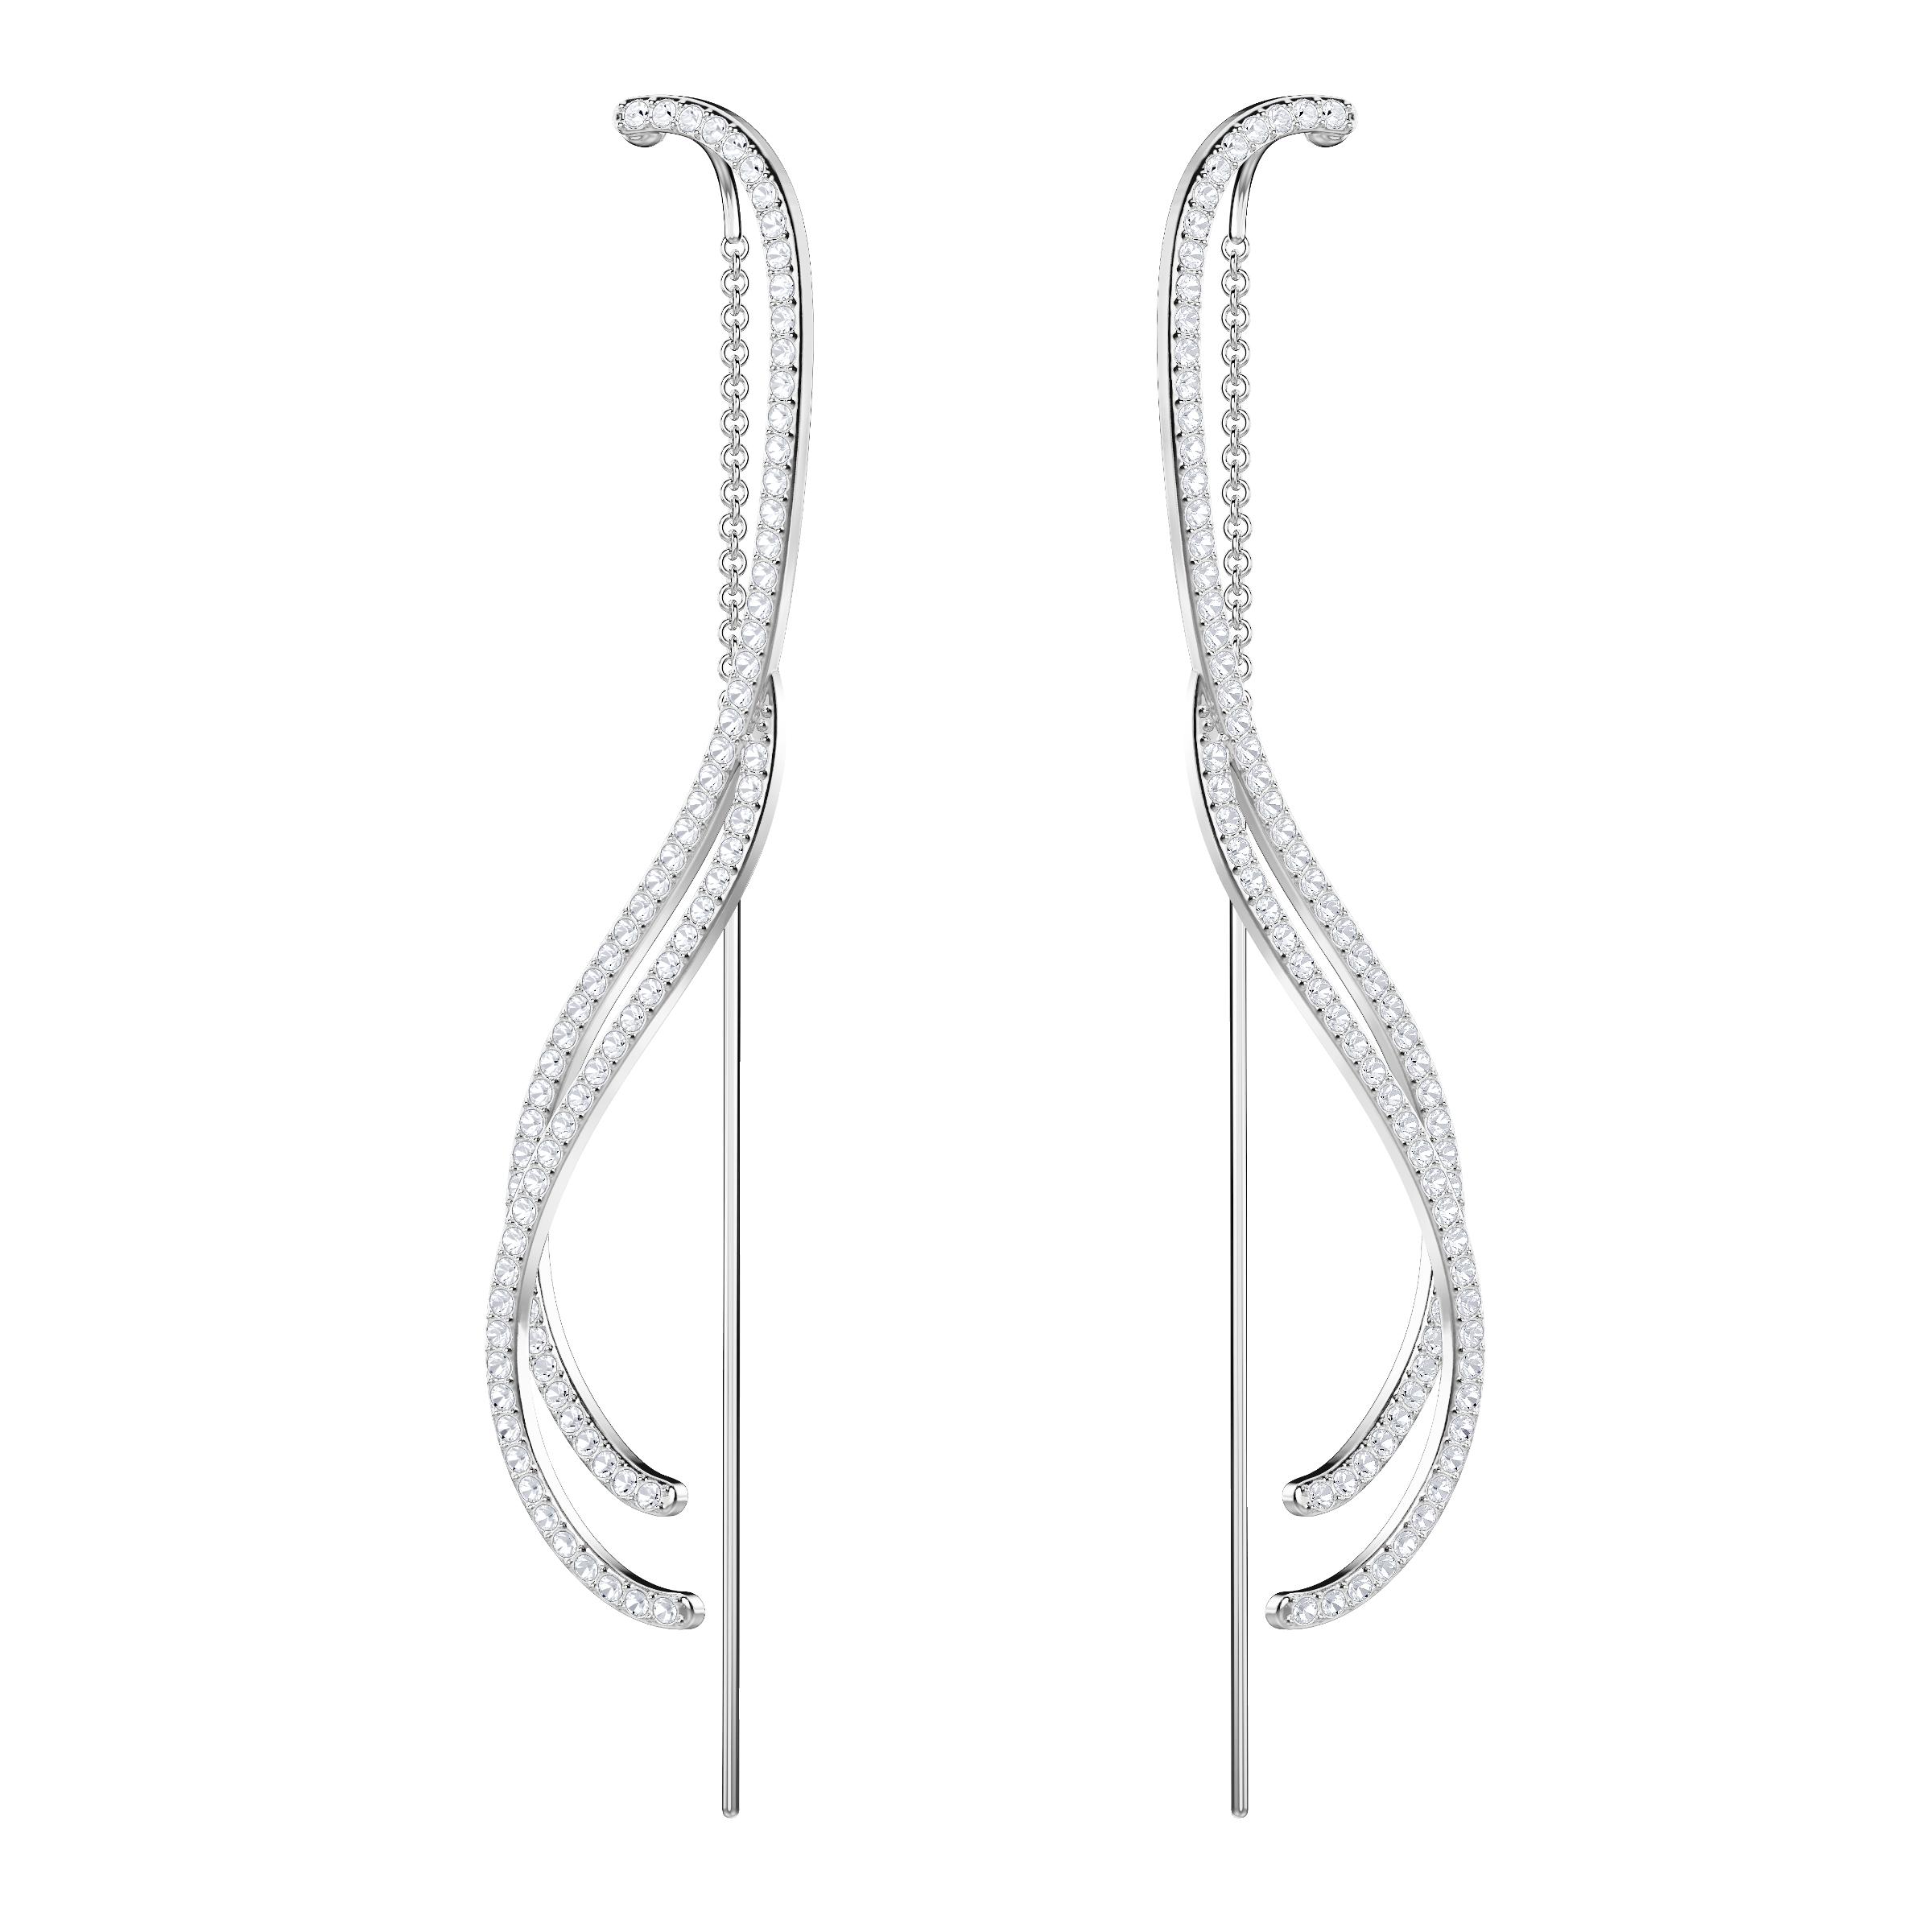 Lemon Chain Pierced Earrings, White, Rhodium Plating